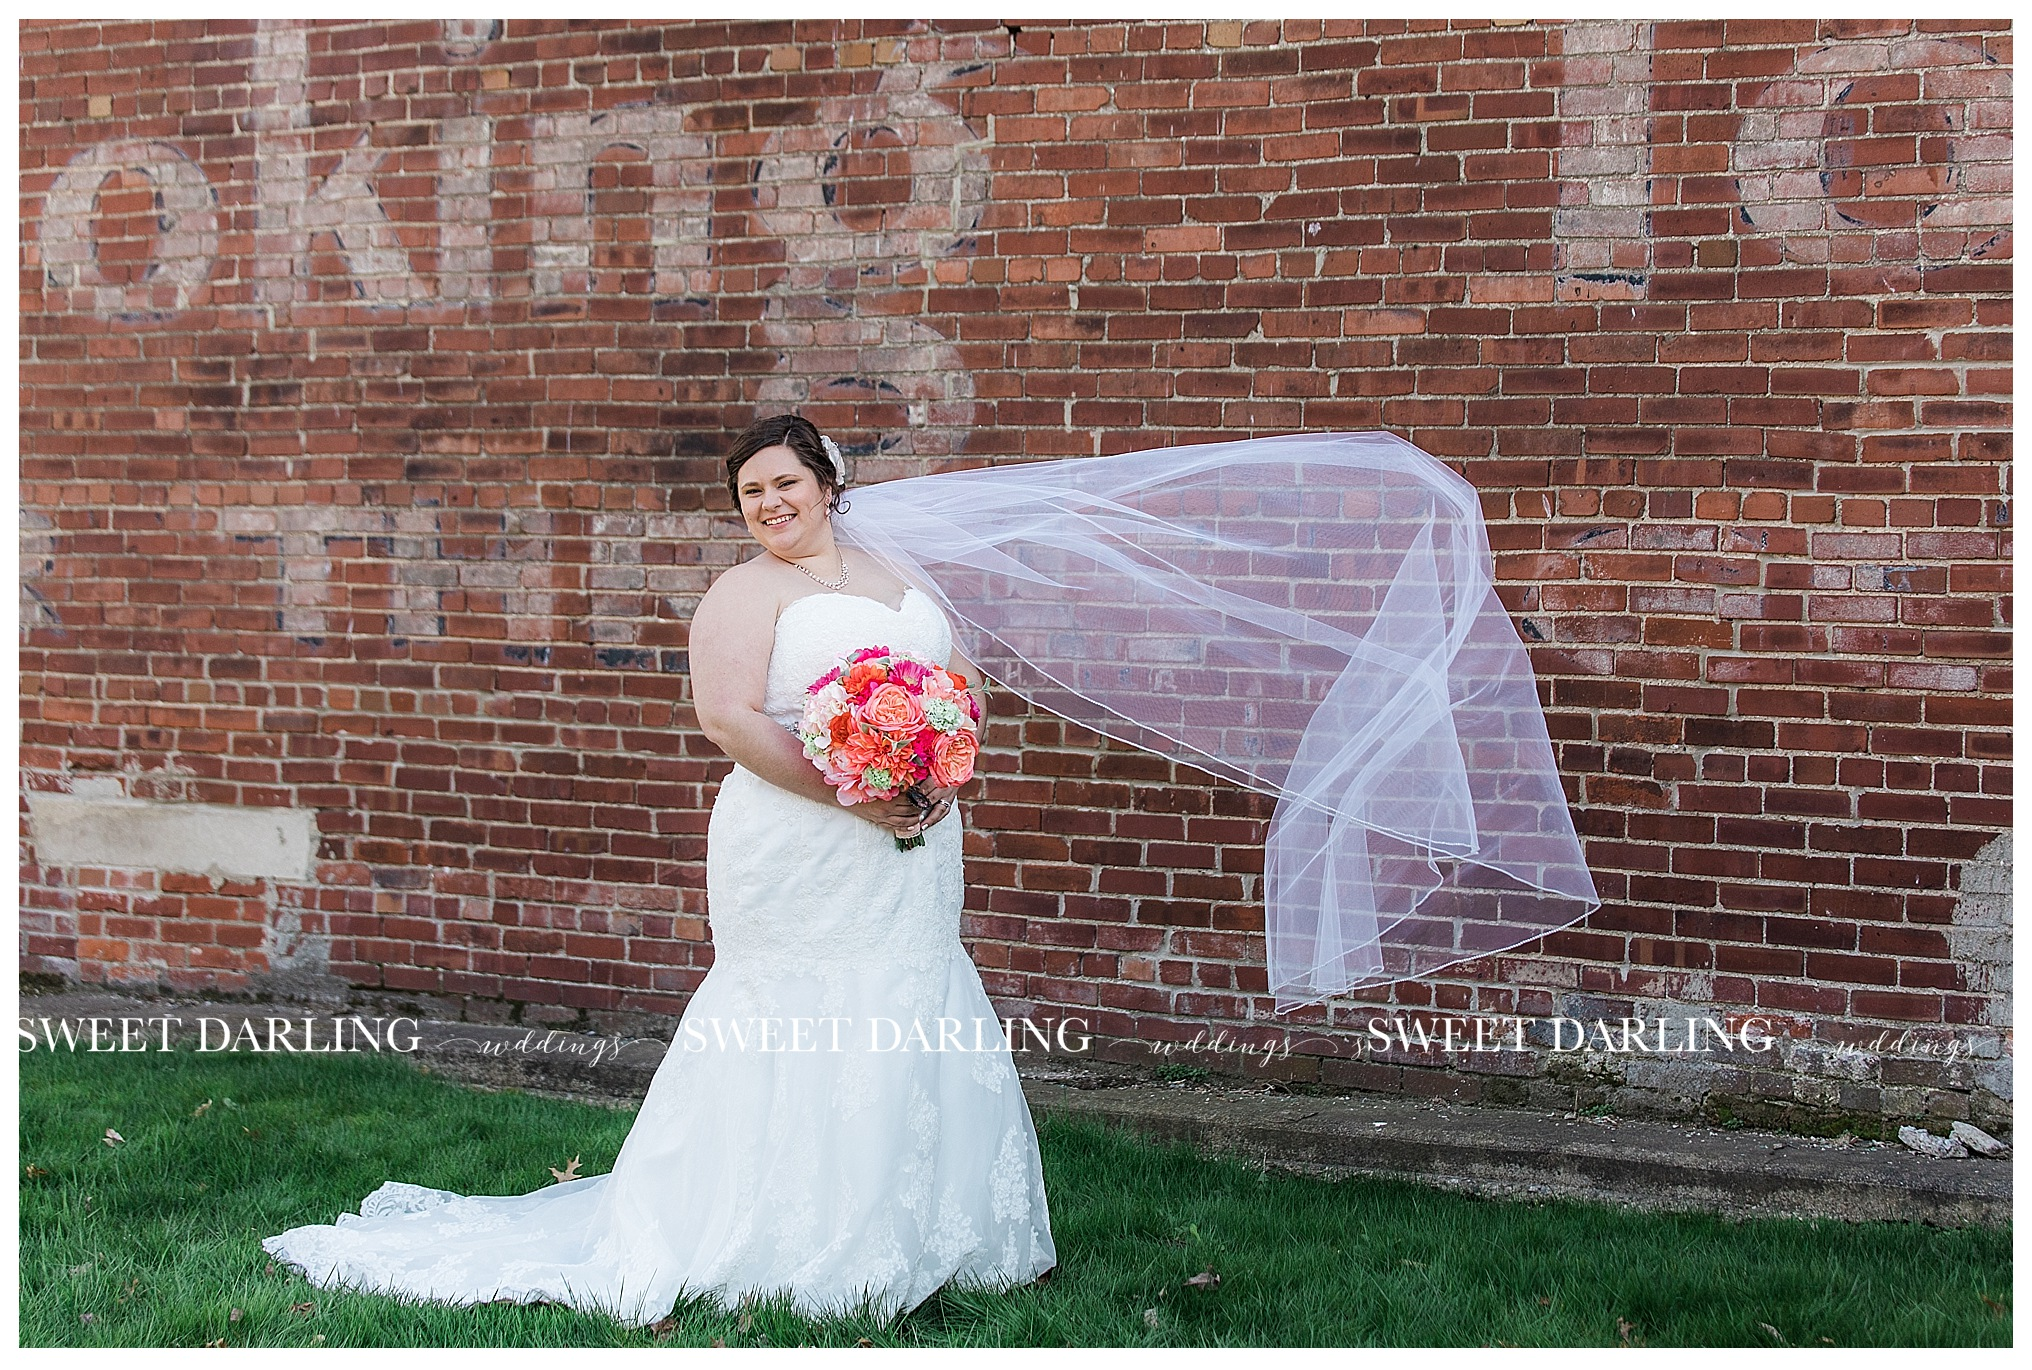 arcoloa-illinois-coles-county-wedding-photography-sweet-darling-weddings-photographer_0948.jpg